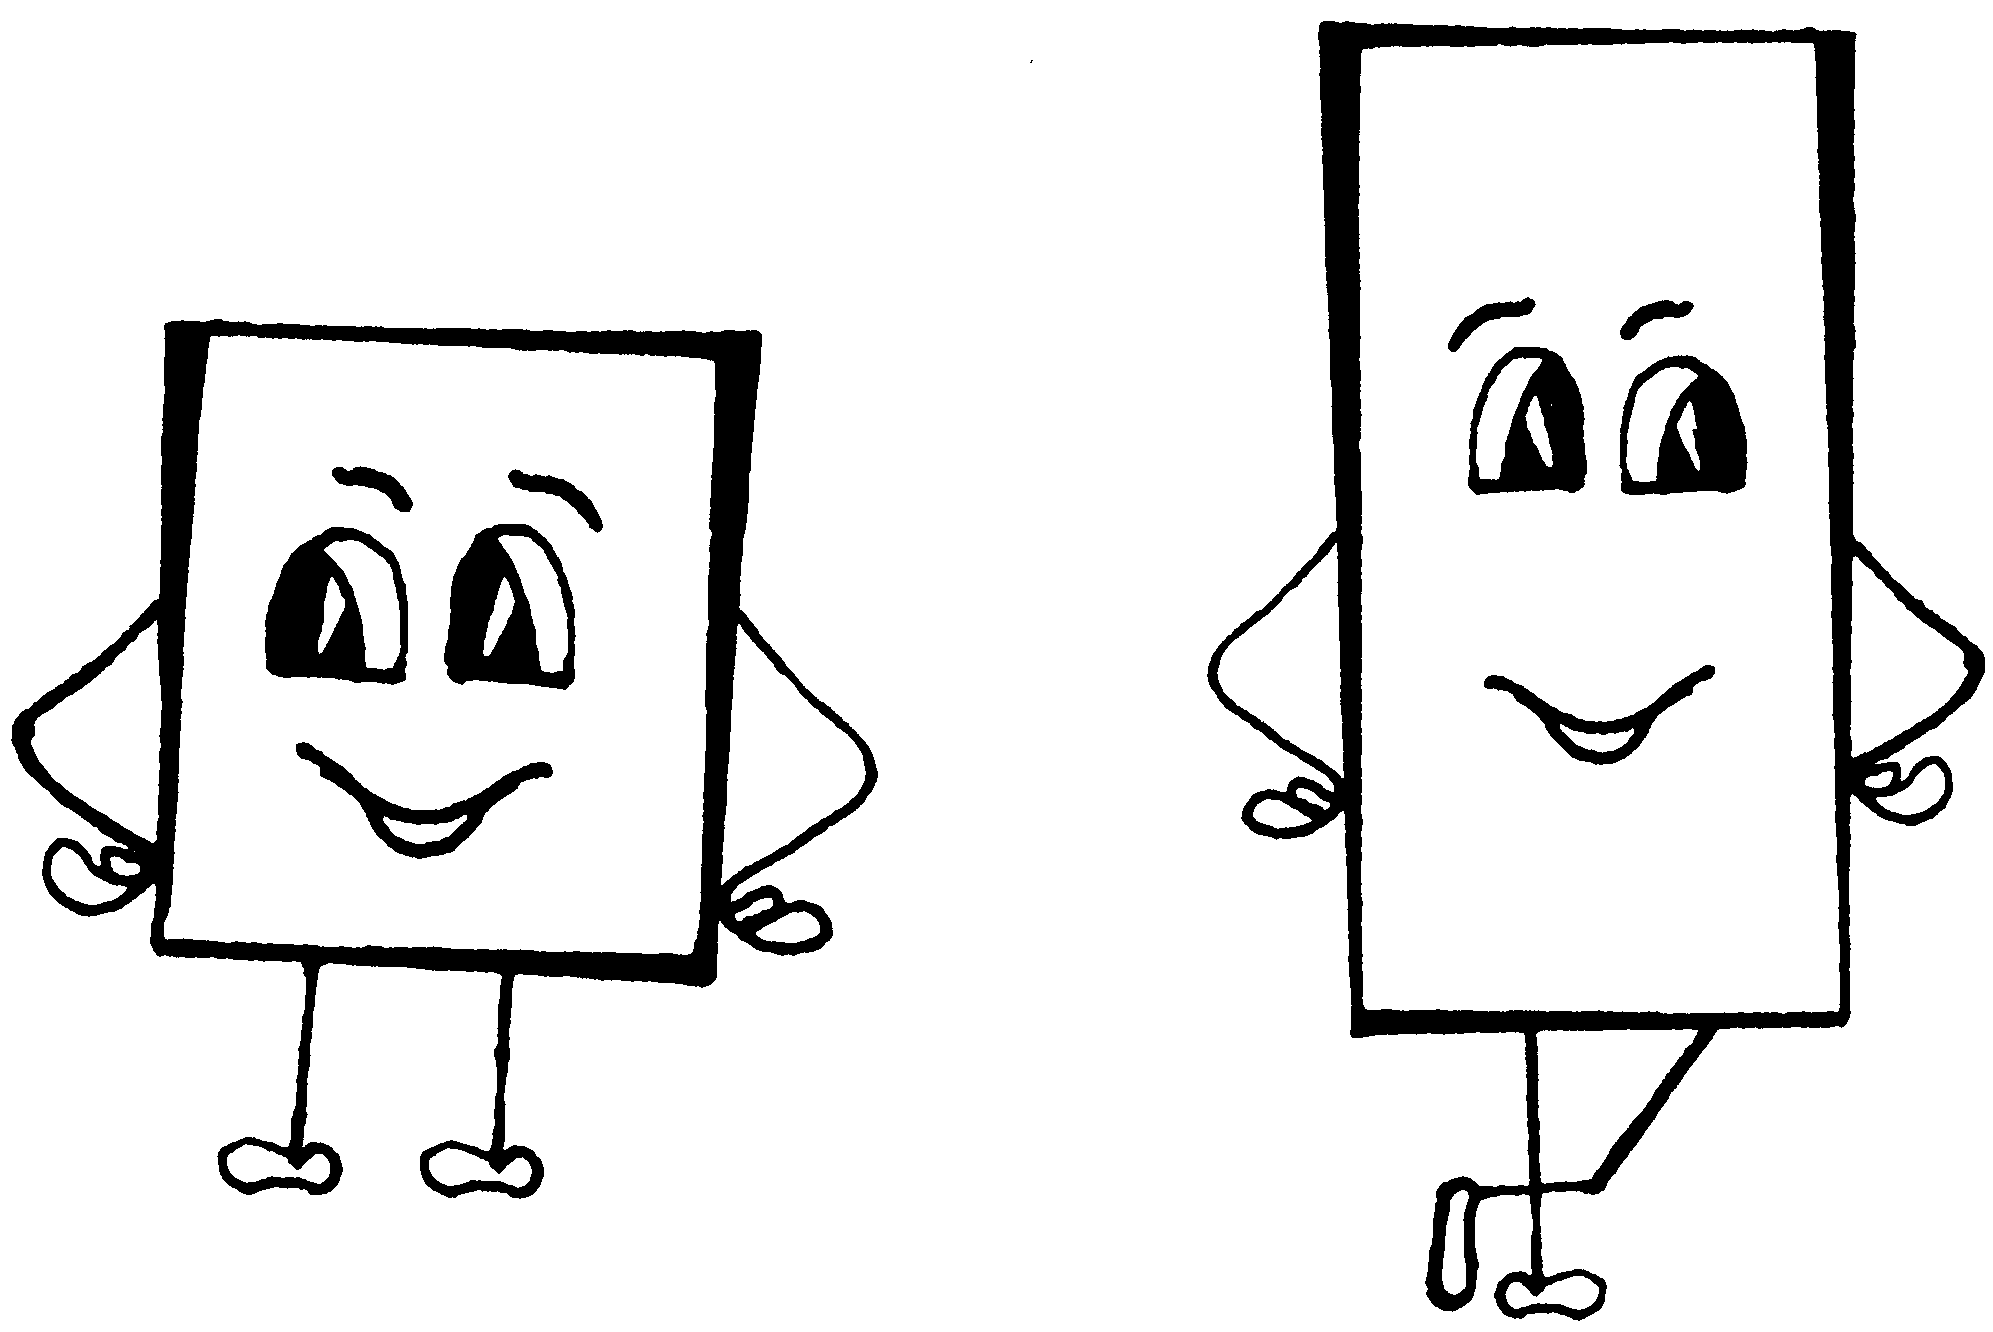 семенович картинки на тему квадрат и прямоугольник них